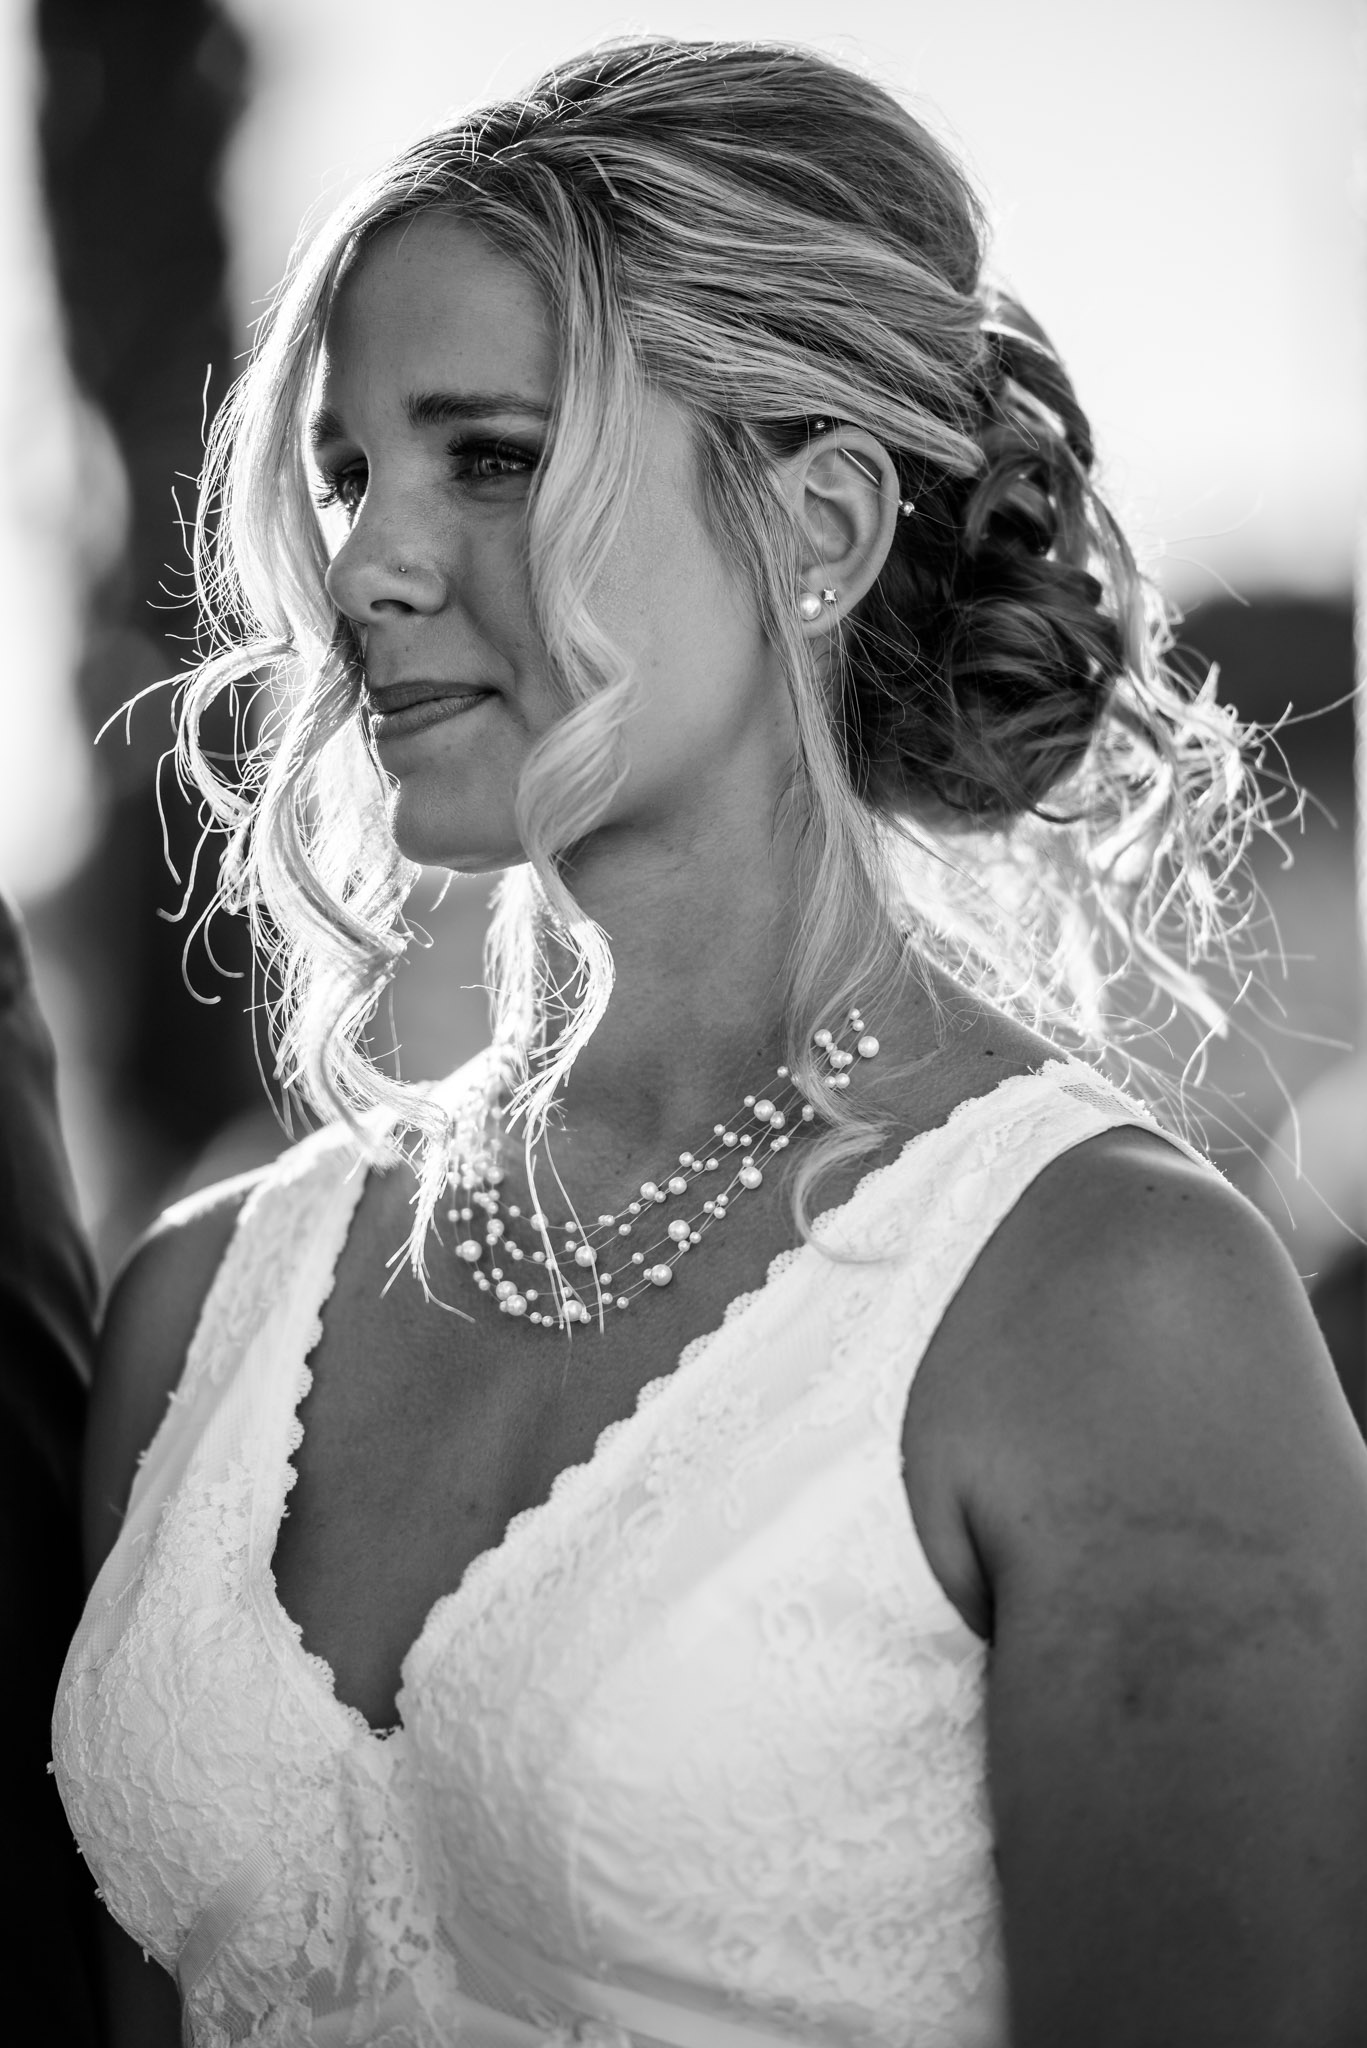 Avensole-Winery-Temecula-Wedding-Josh-and-Olivia-3534.JPG